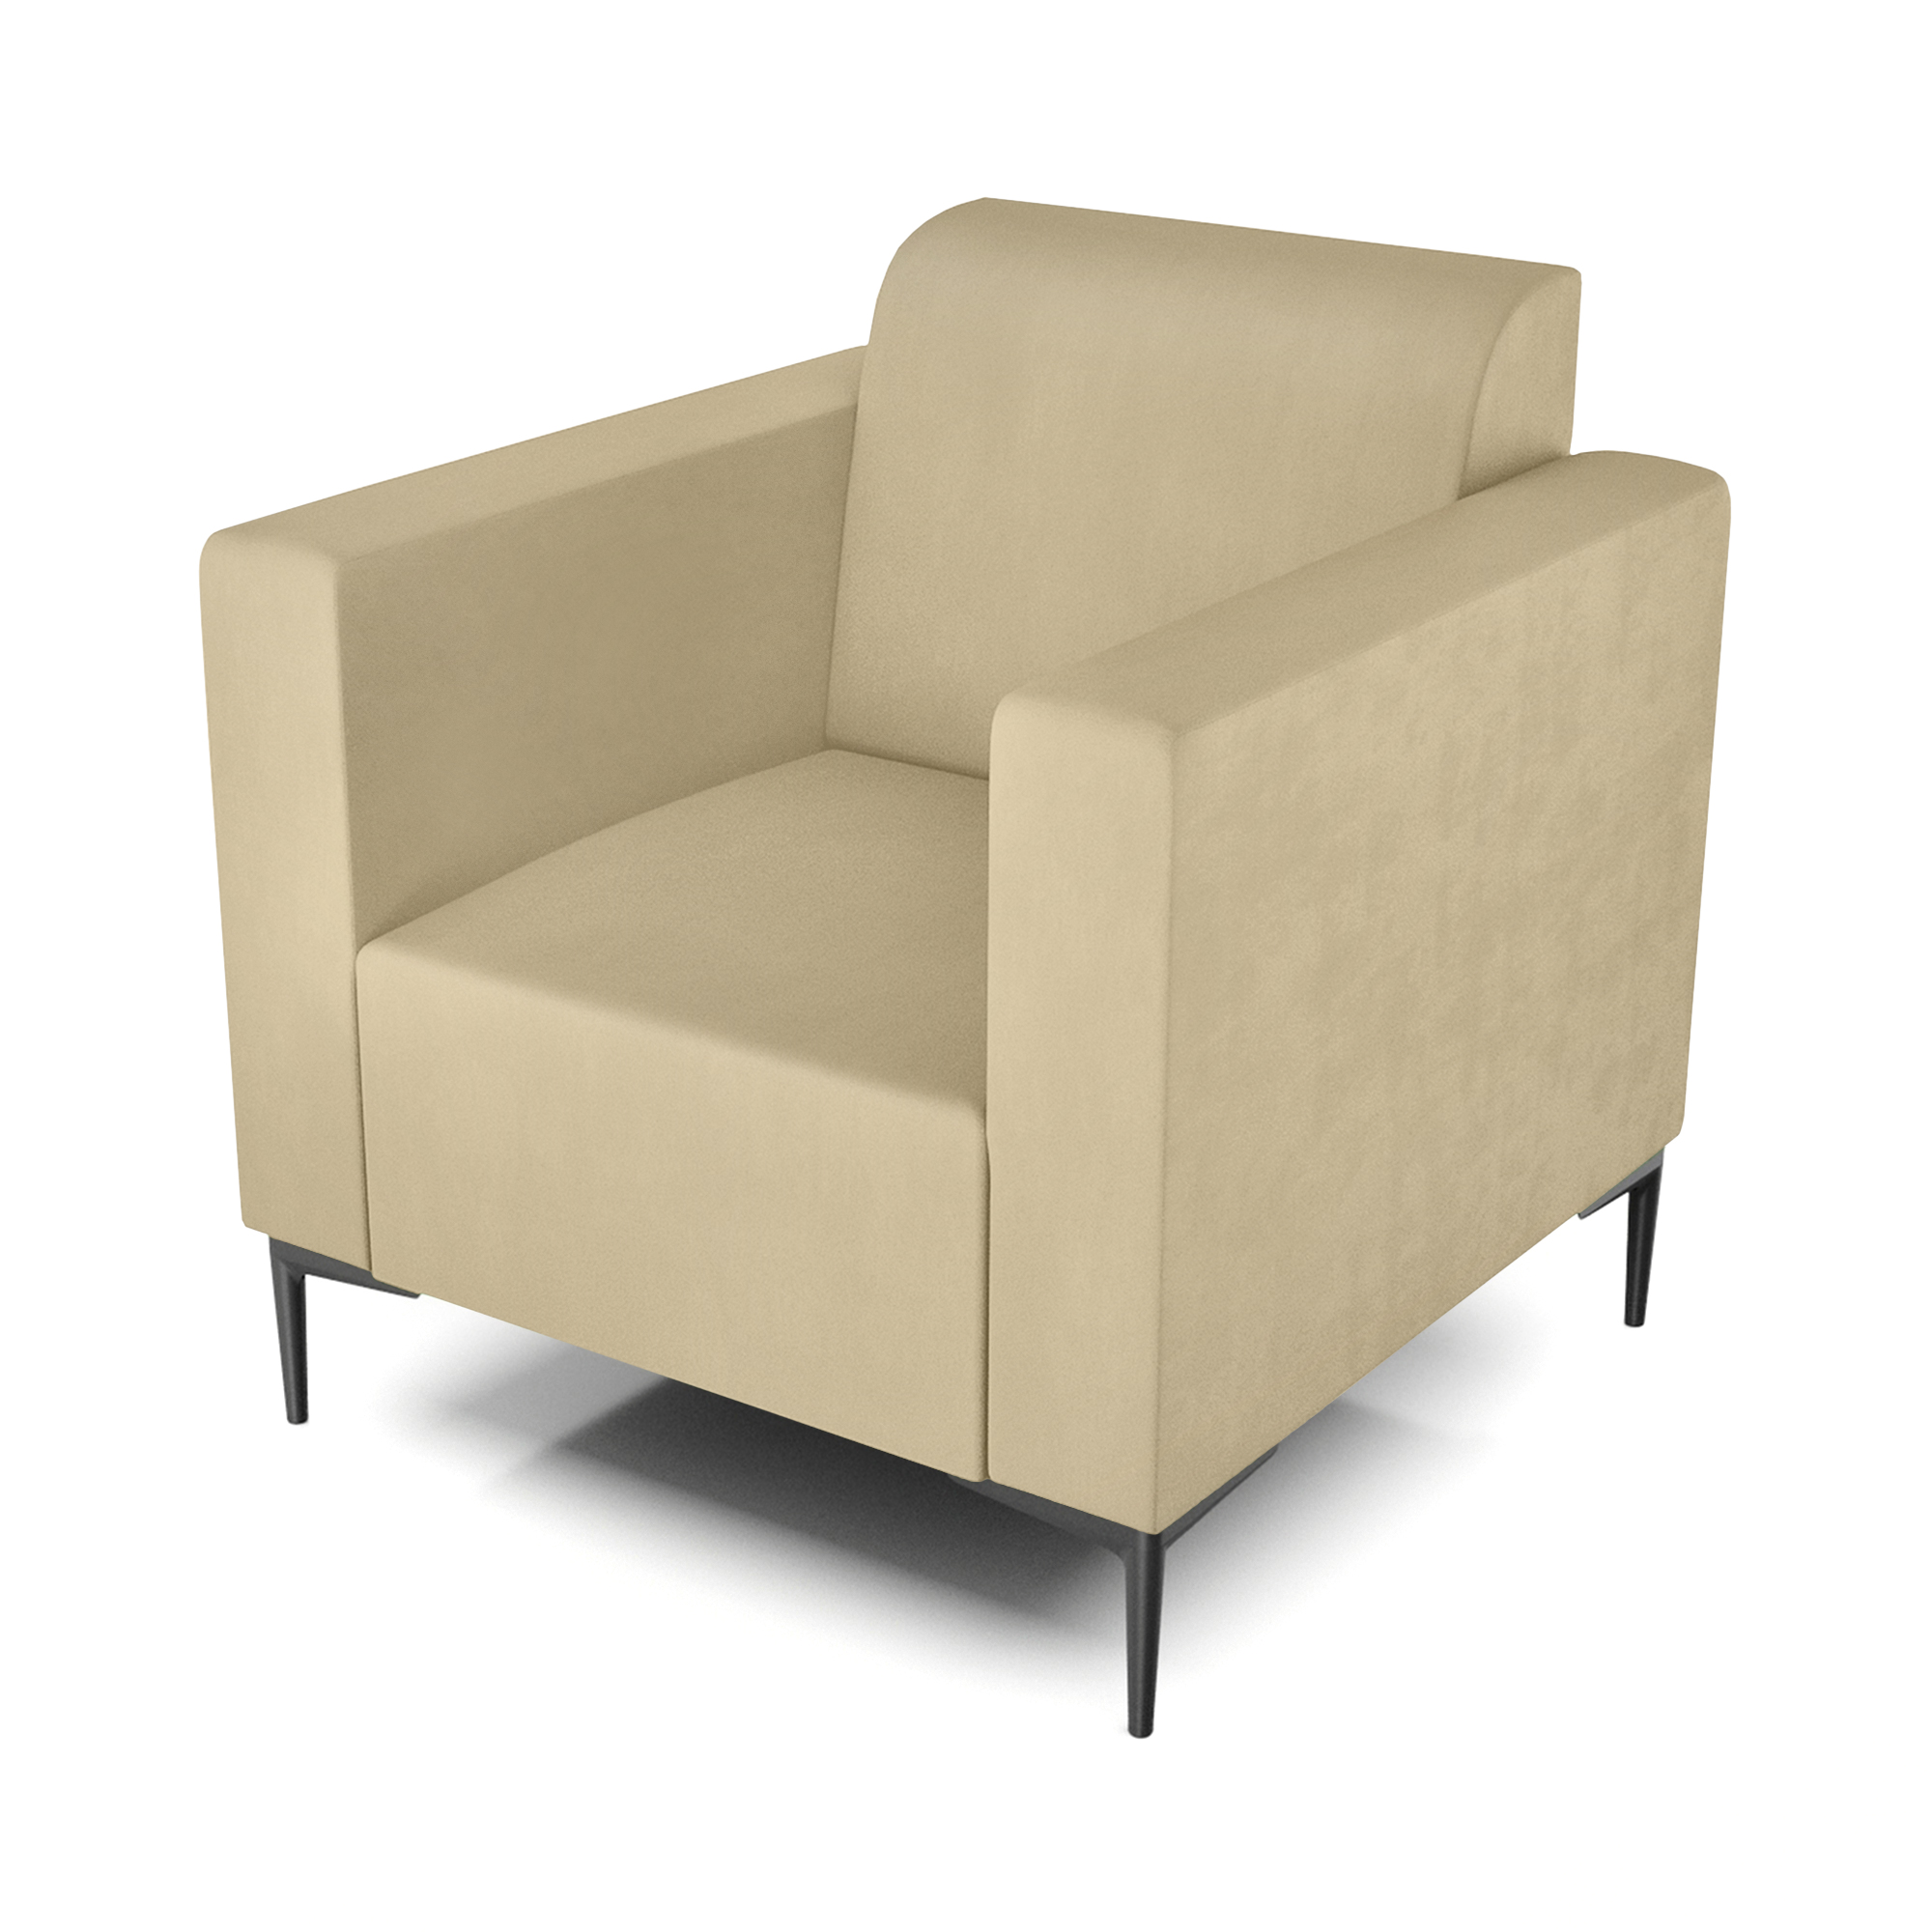 Кресло AS Тиффани 79x78x73 см бежевый кресло as тиффани 79x78x73 см коричневый